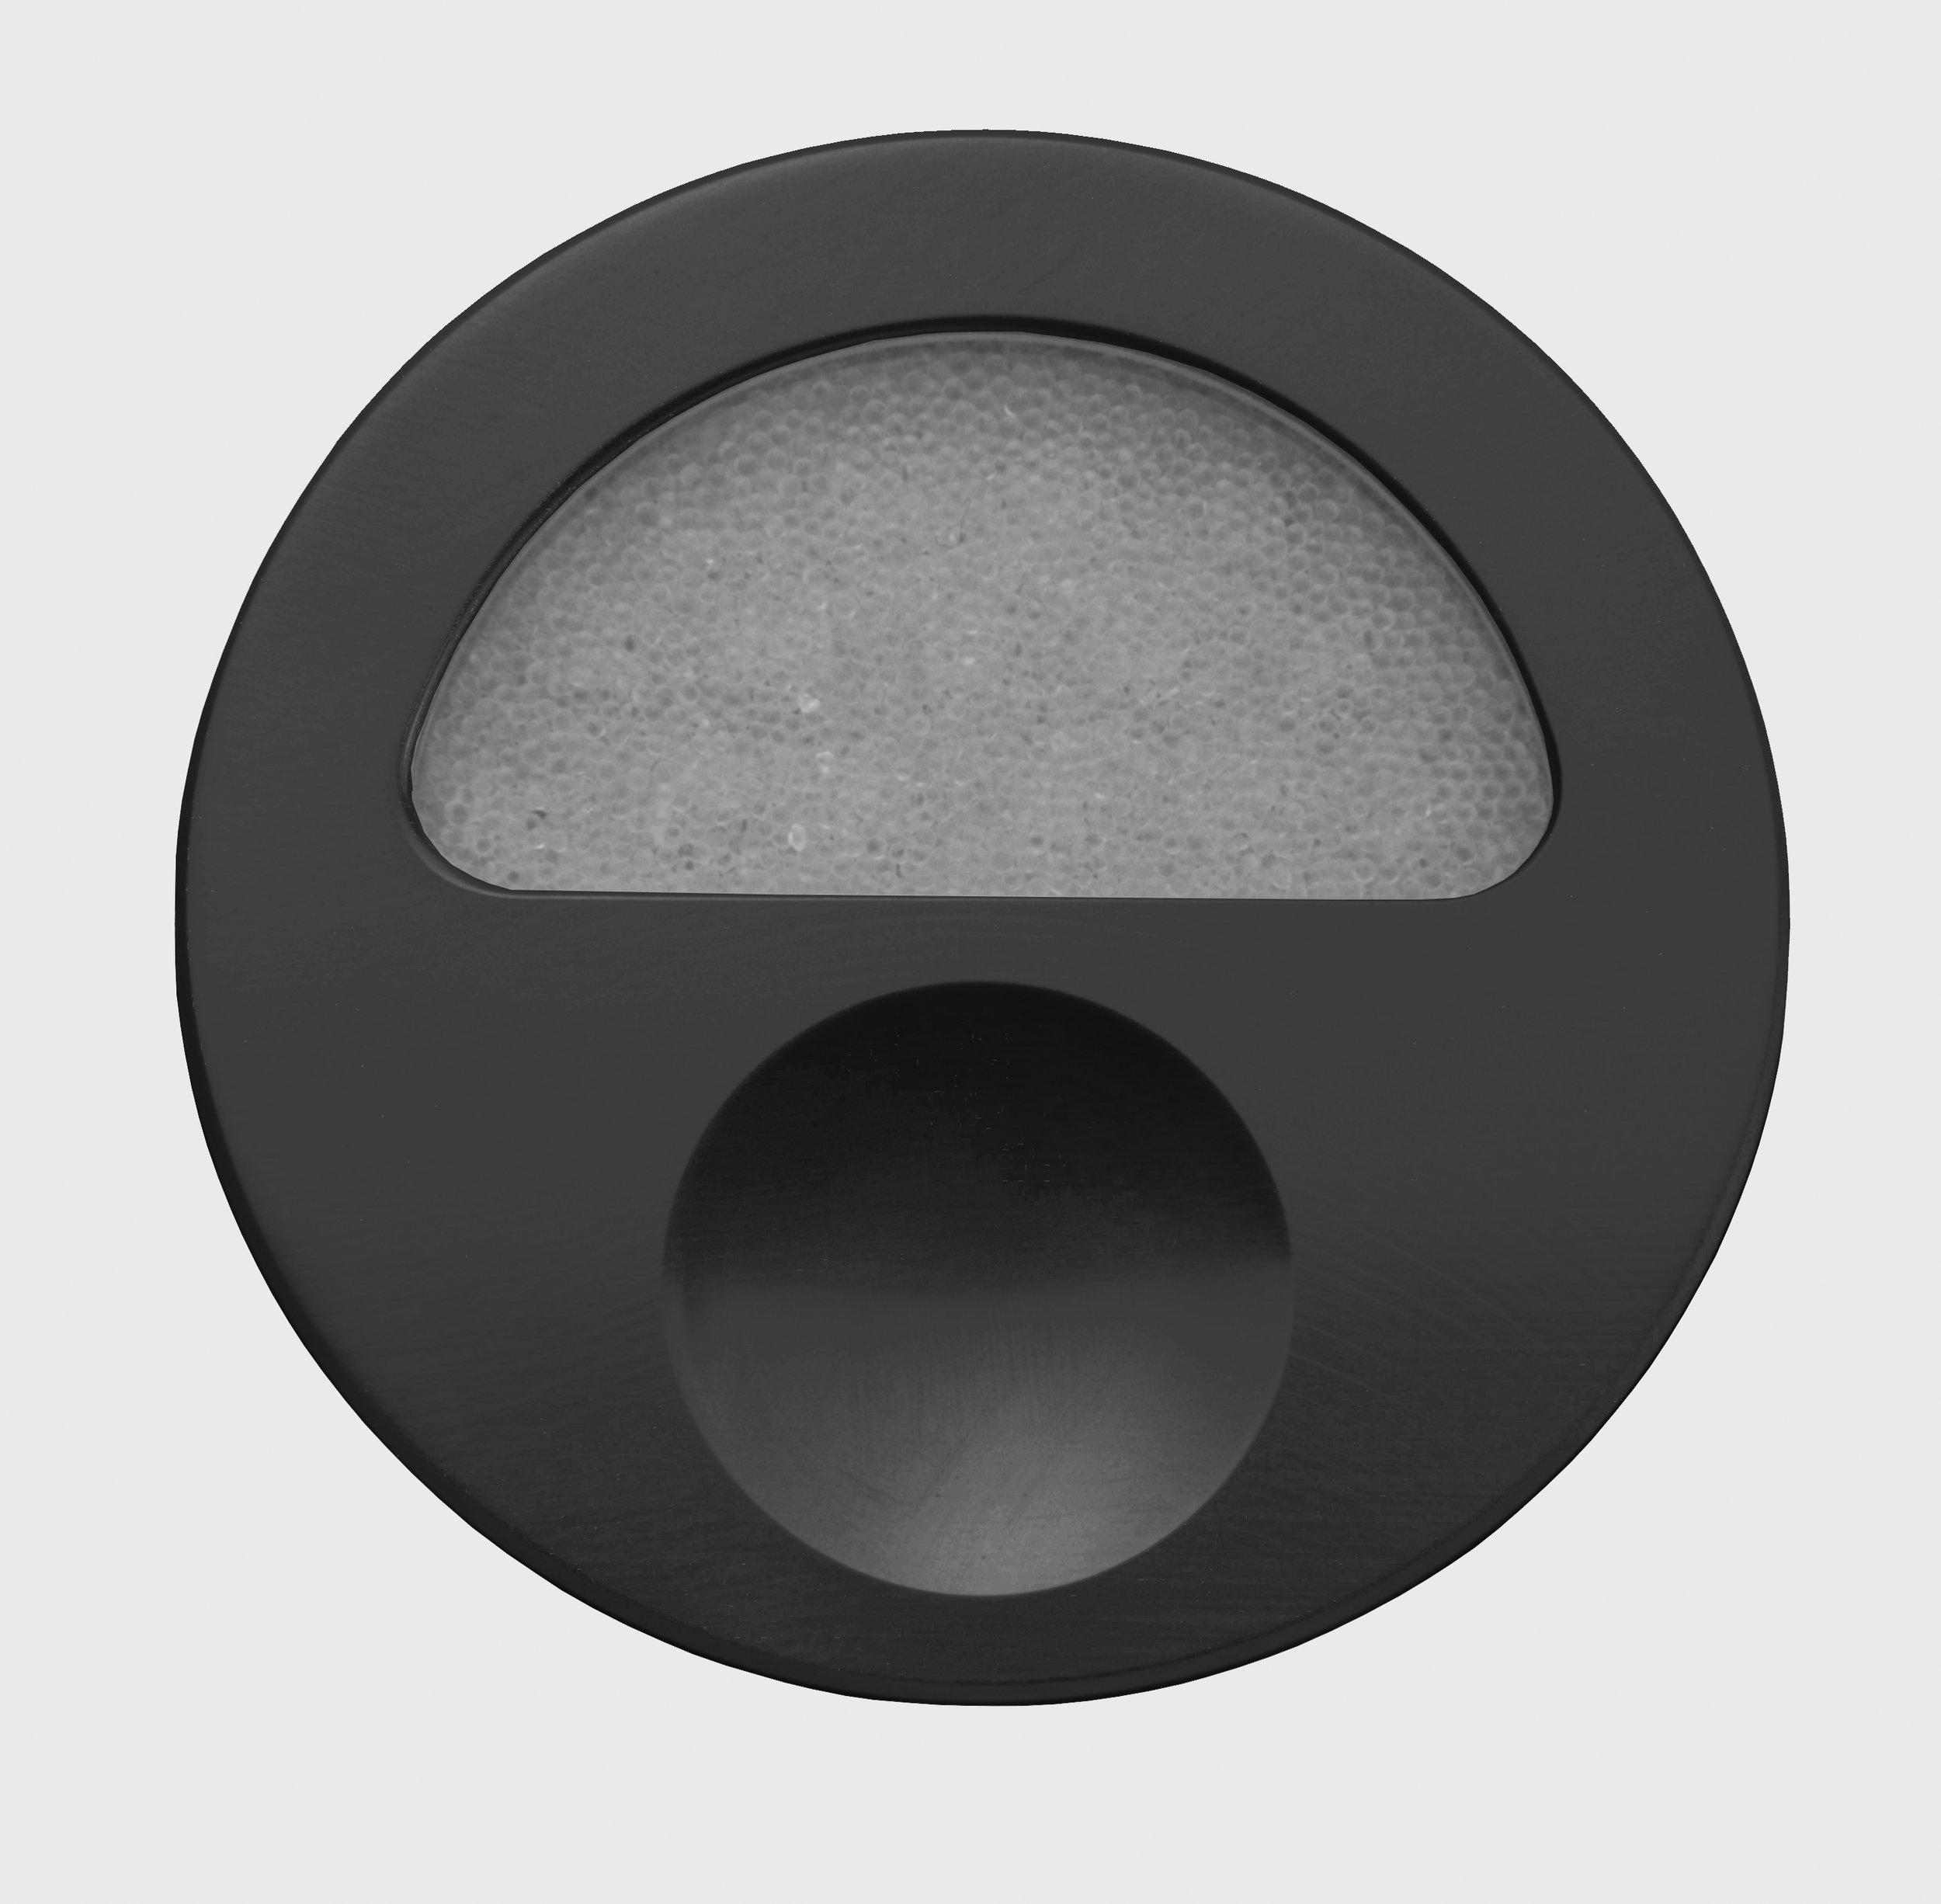 Zephyr-Black-Front-Closed-Off-GB.jpg